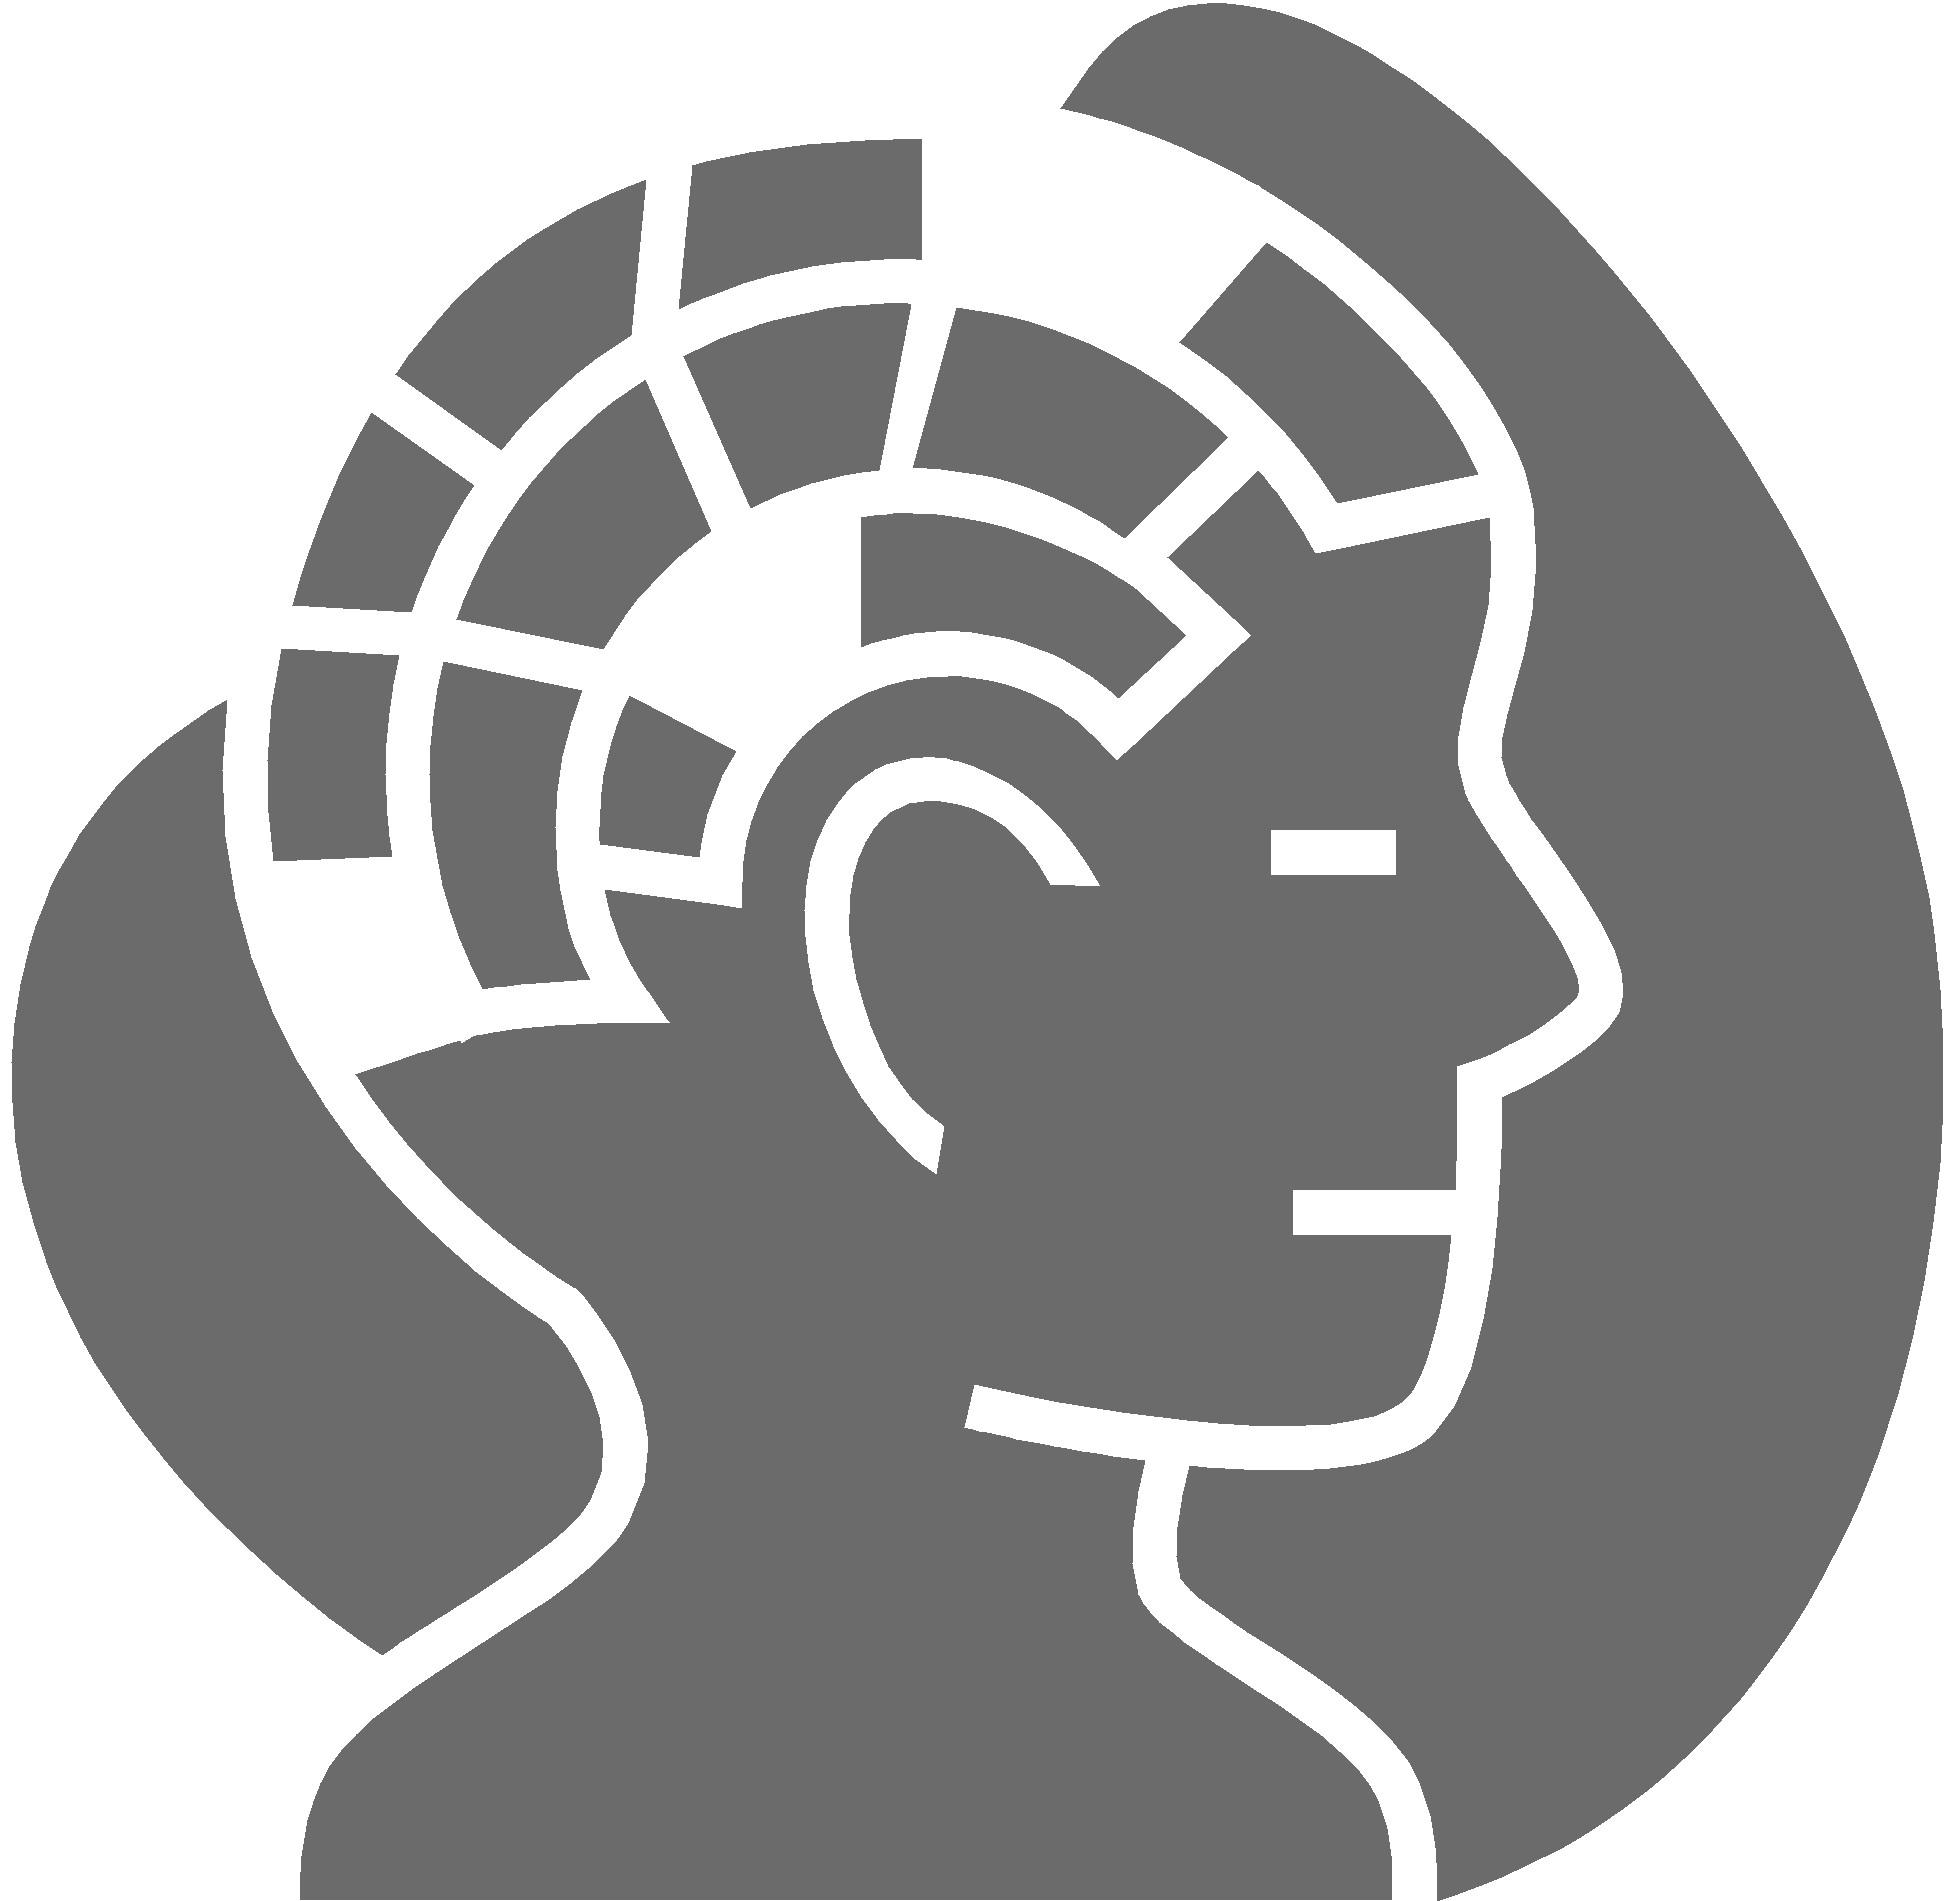 psychology clipart